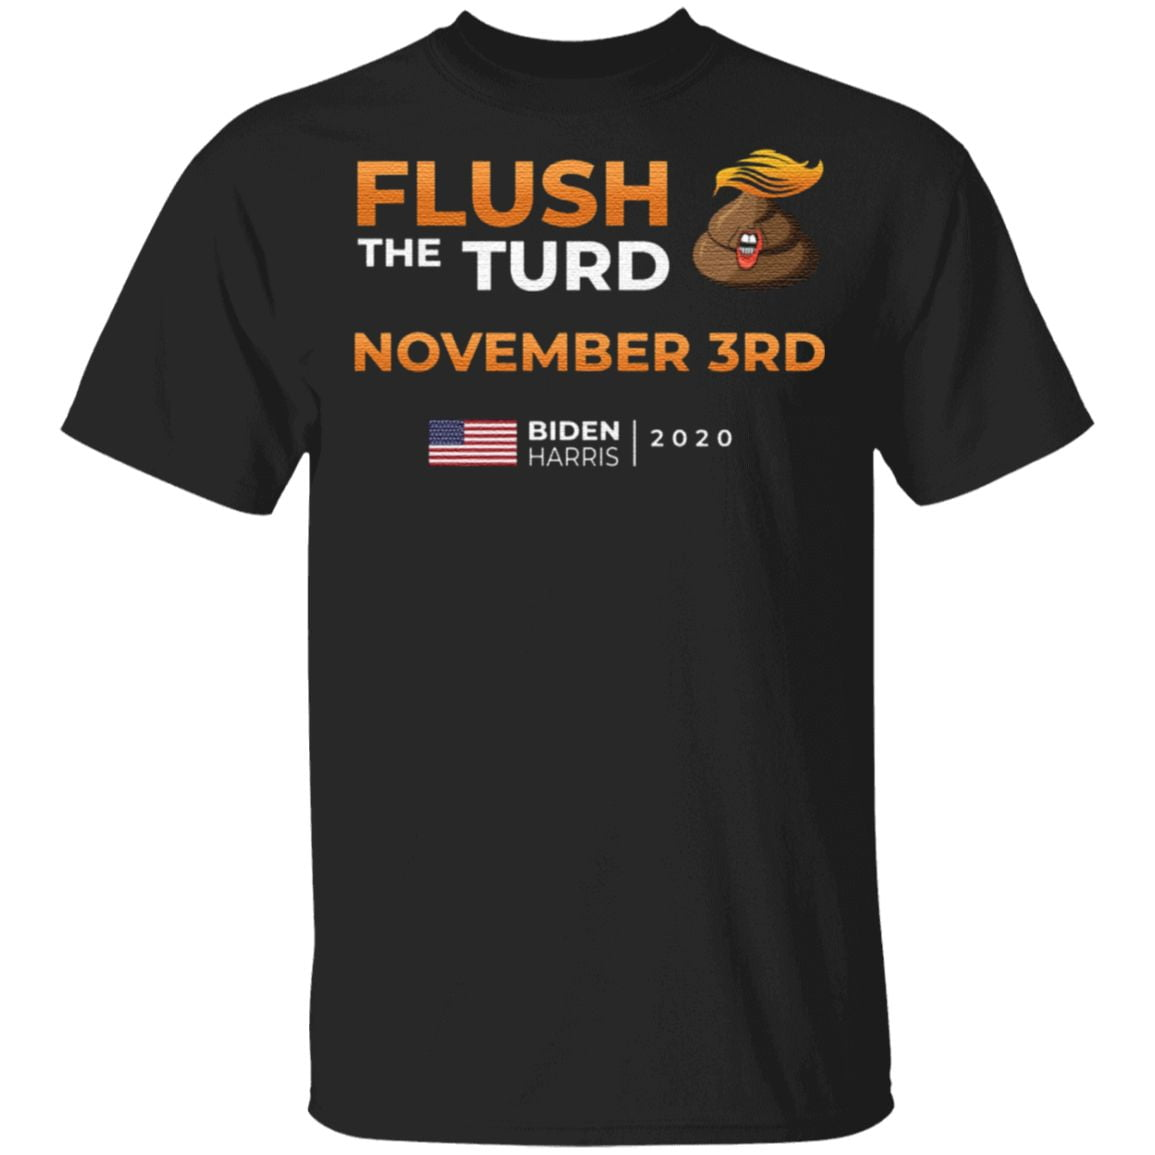 Flush The Turd November 3rd Biden Harris 2020 T Shirt